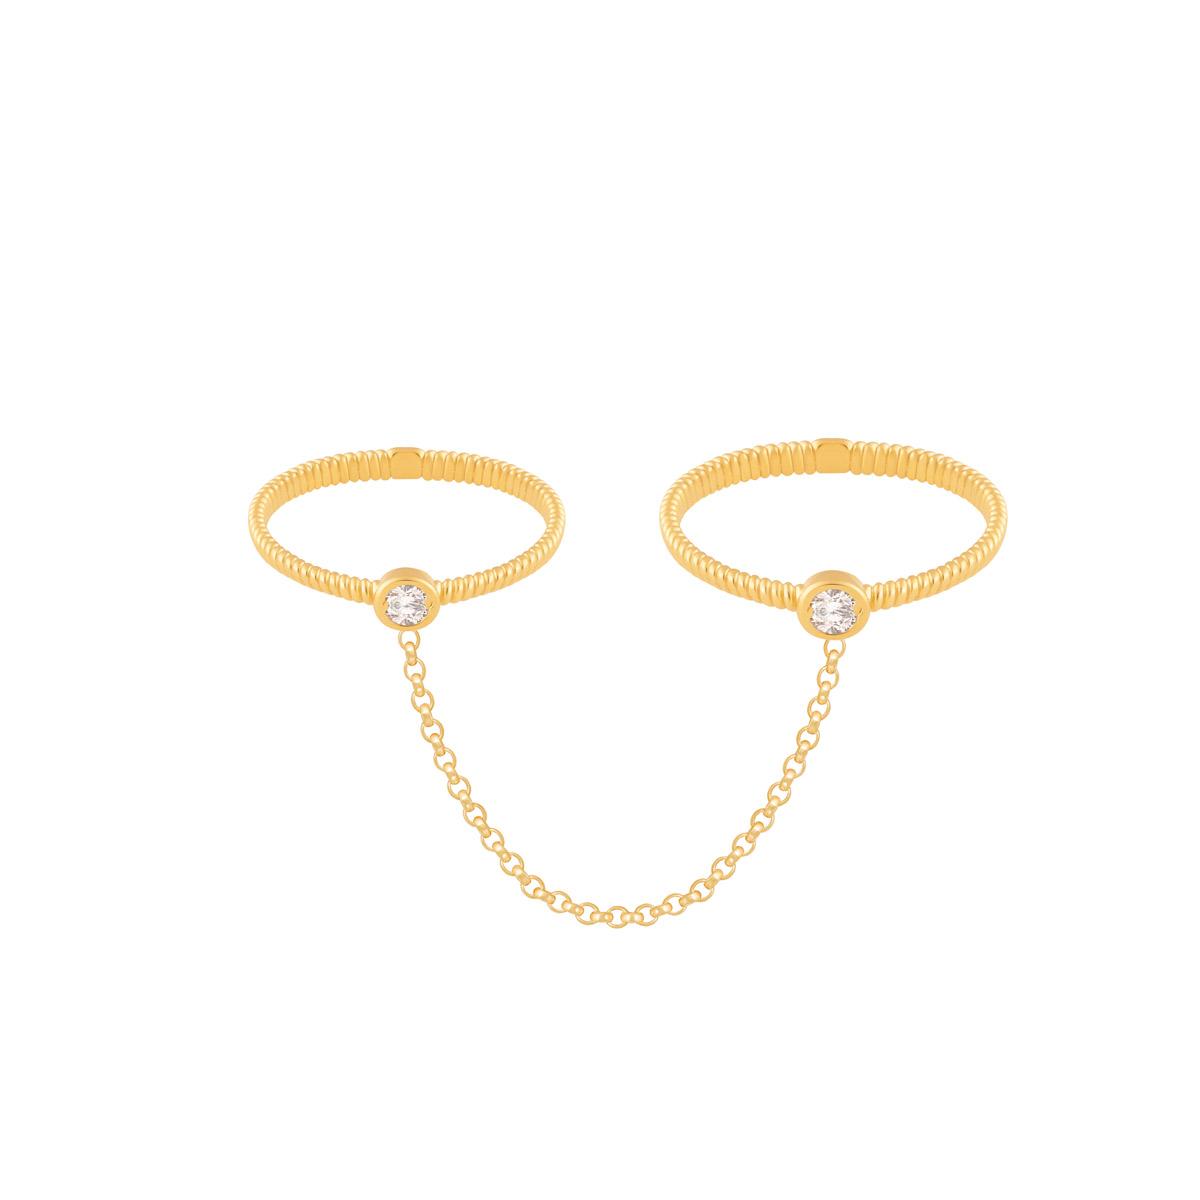 انگشتر طلا تک نگین سفید متصل